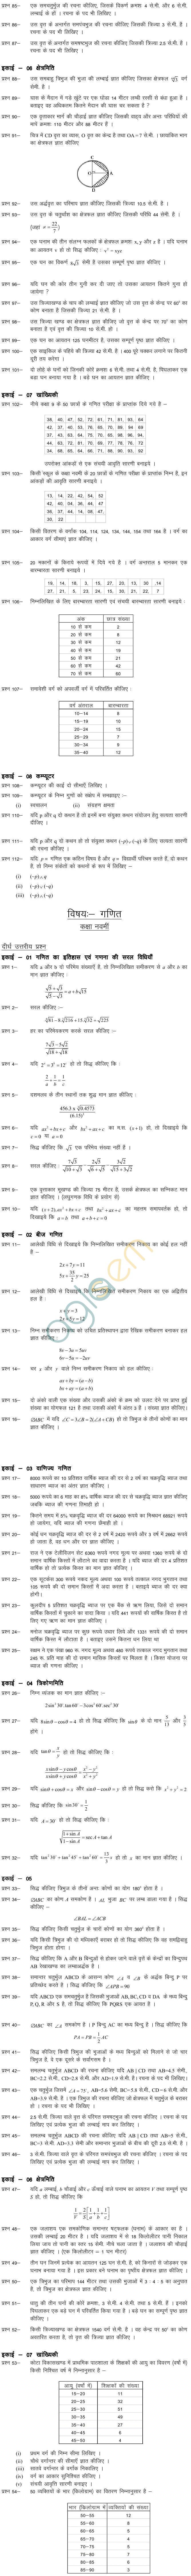 Chhattisgarh Board Class 09 Question Bank -Maths